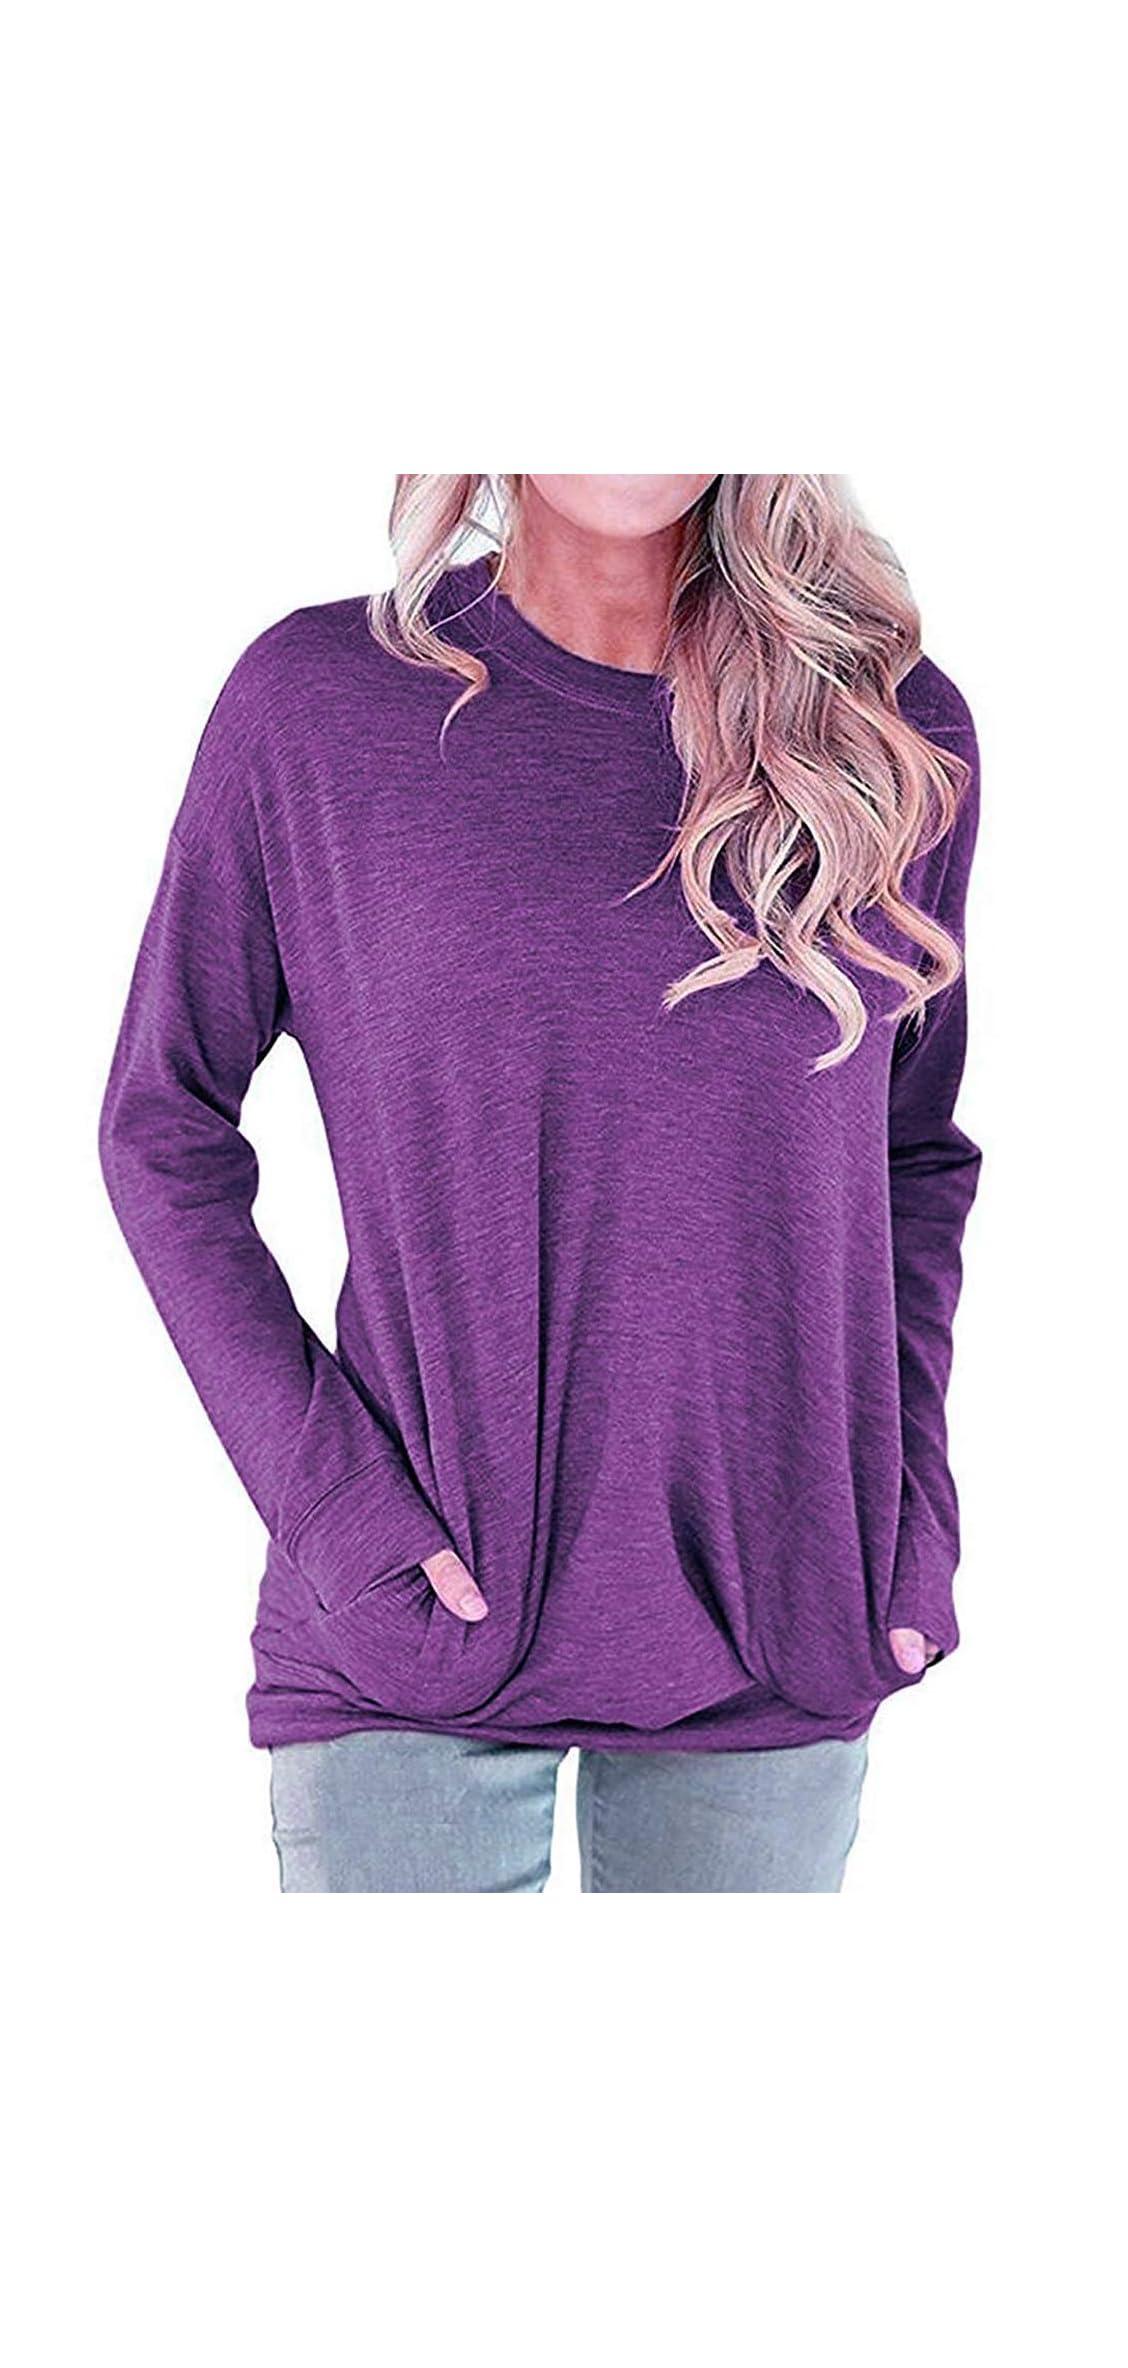 Womens Long Sleeve Sweatshirt Loose T-shirt Blouses